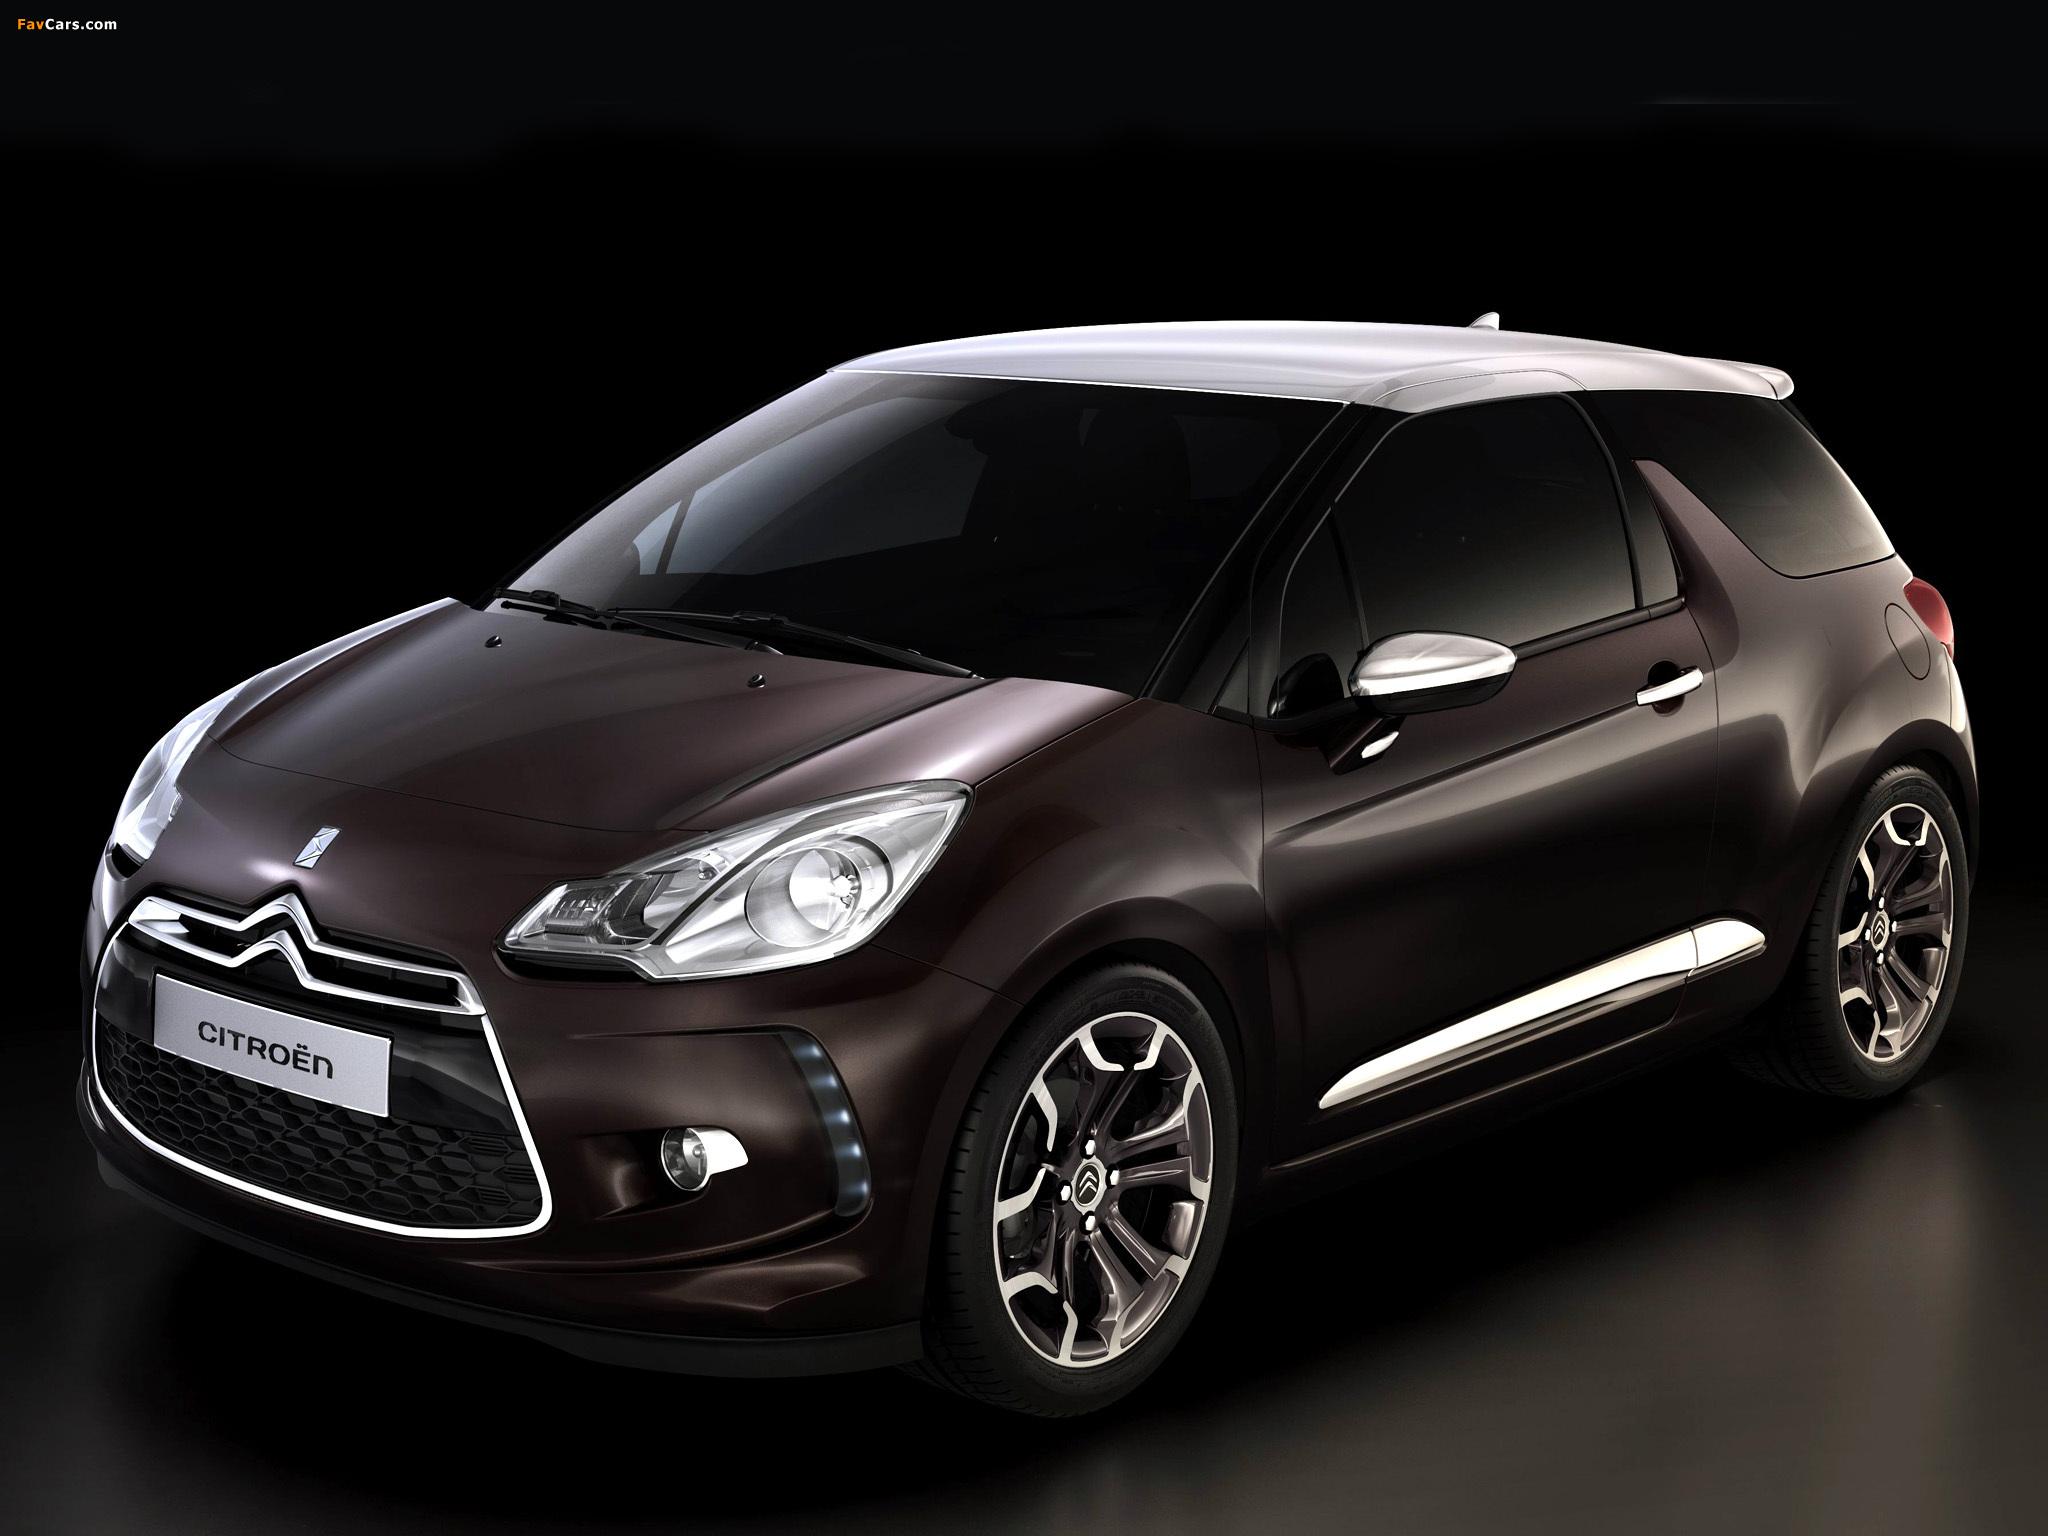 Citroën DS Inside Concept 2009 wallpapers (2048 x 1536)